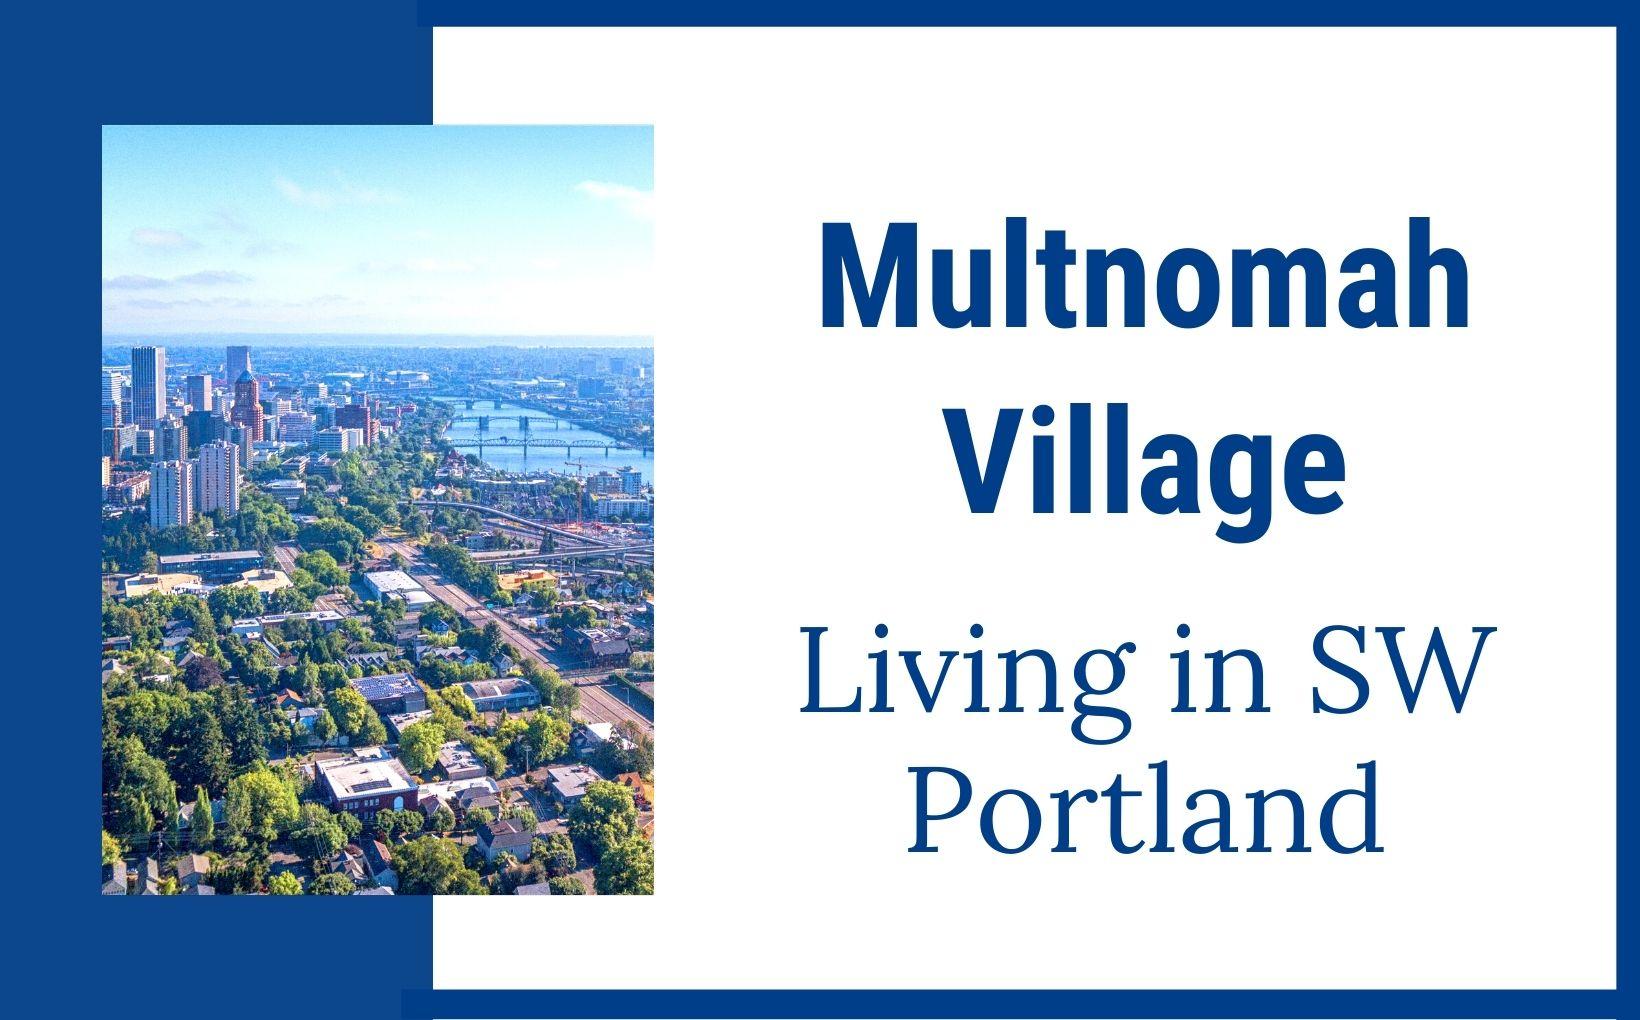 Multnomah Village - Living in Southwest Portland OR feature image